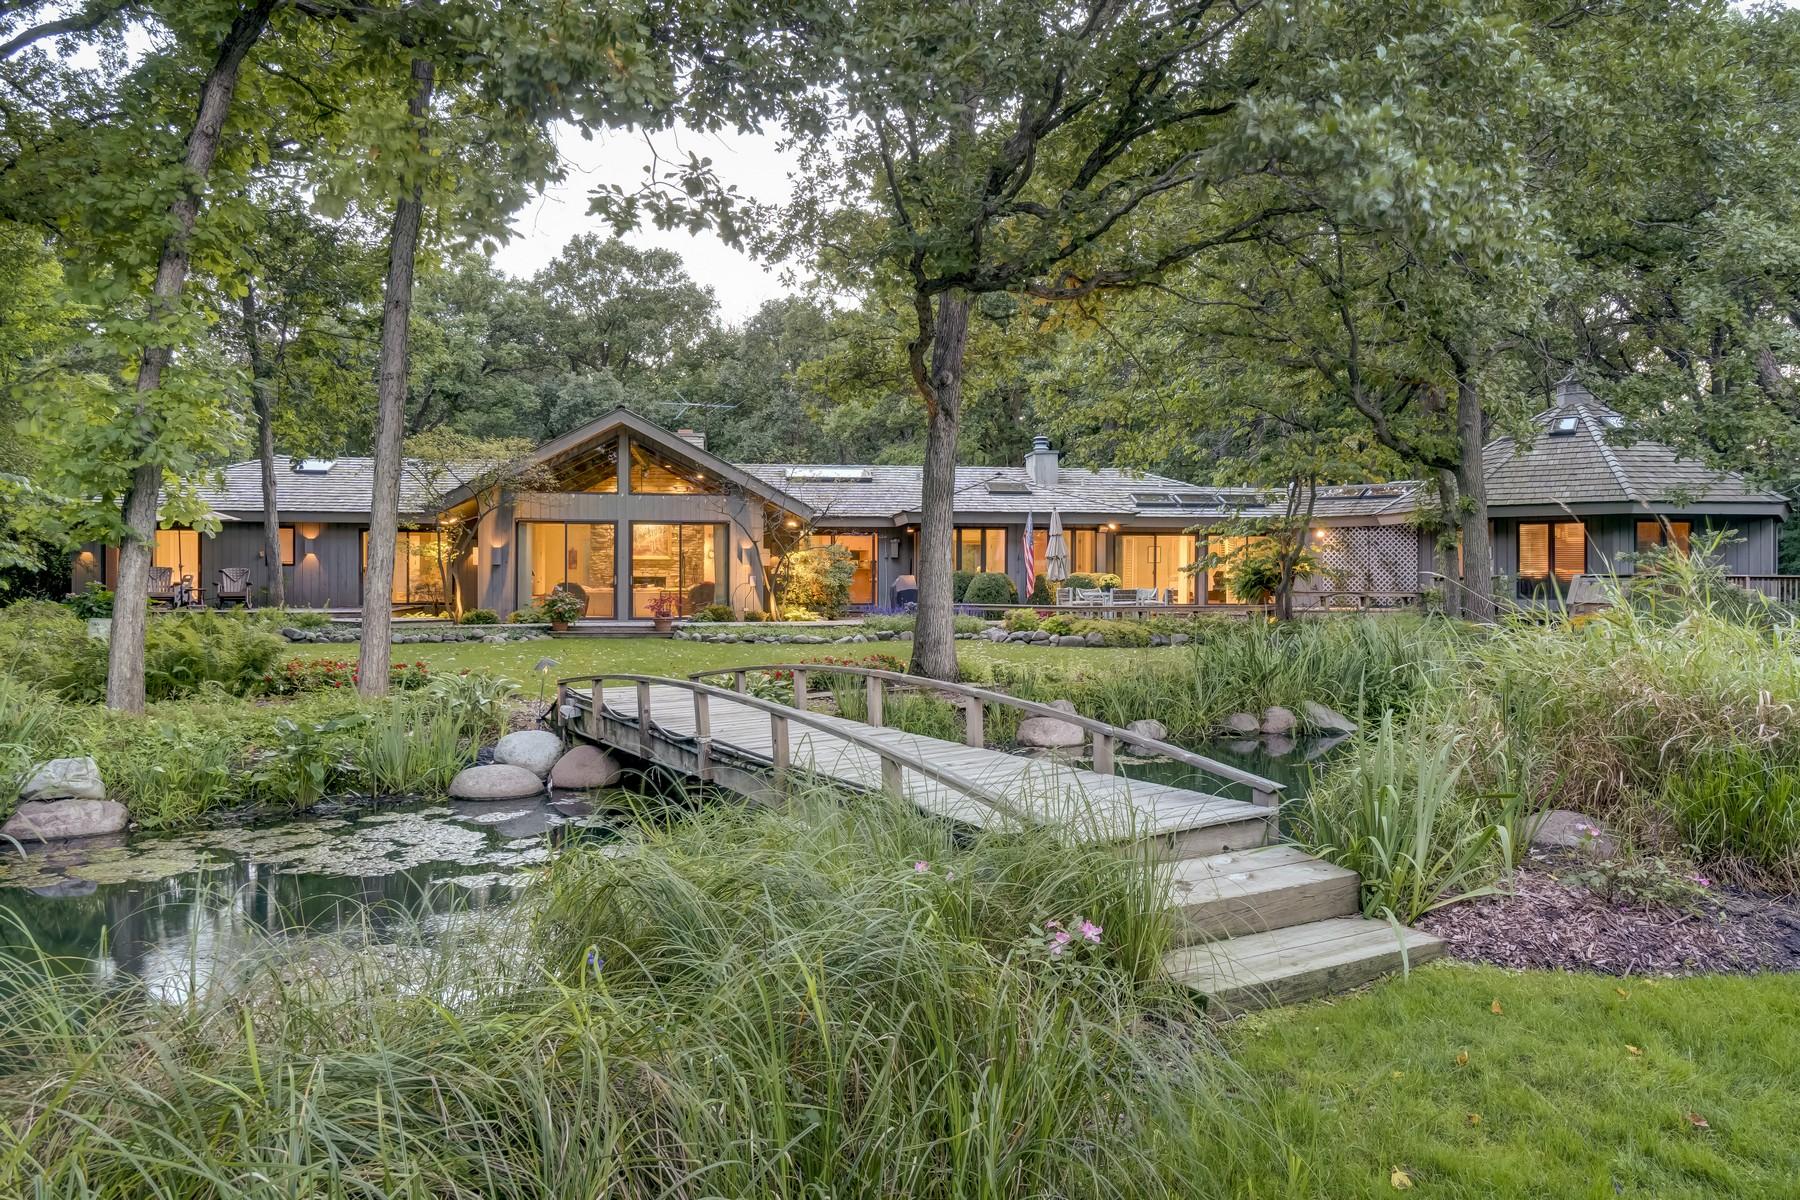 Single Family Home for Sale at Glorious Retreat 1910 Duffy Lane Bannockburn, Illinois 60015 United States